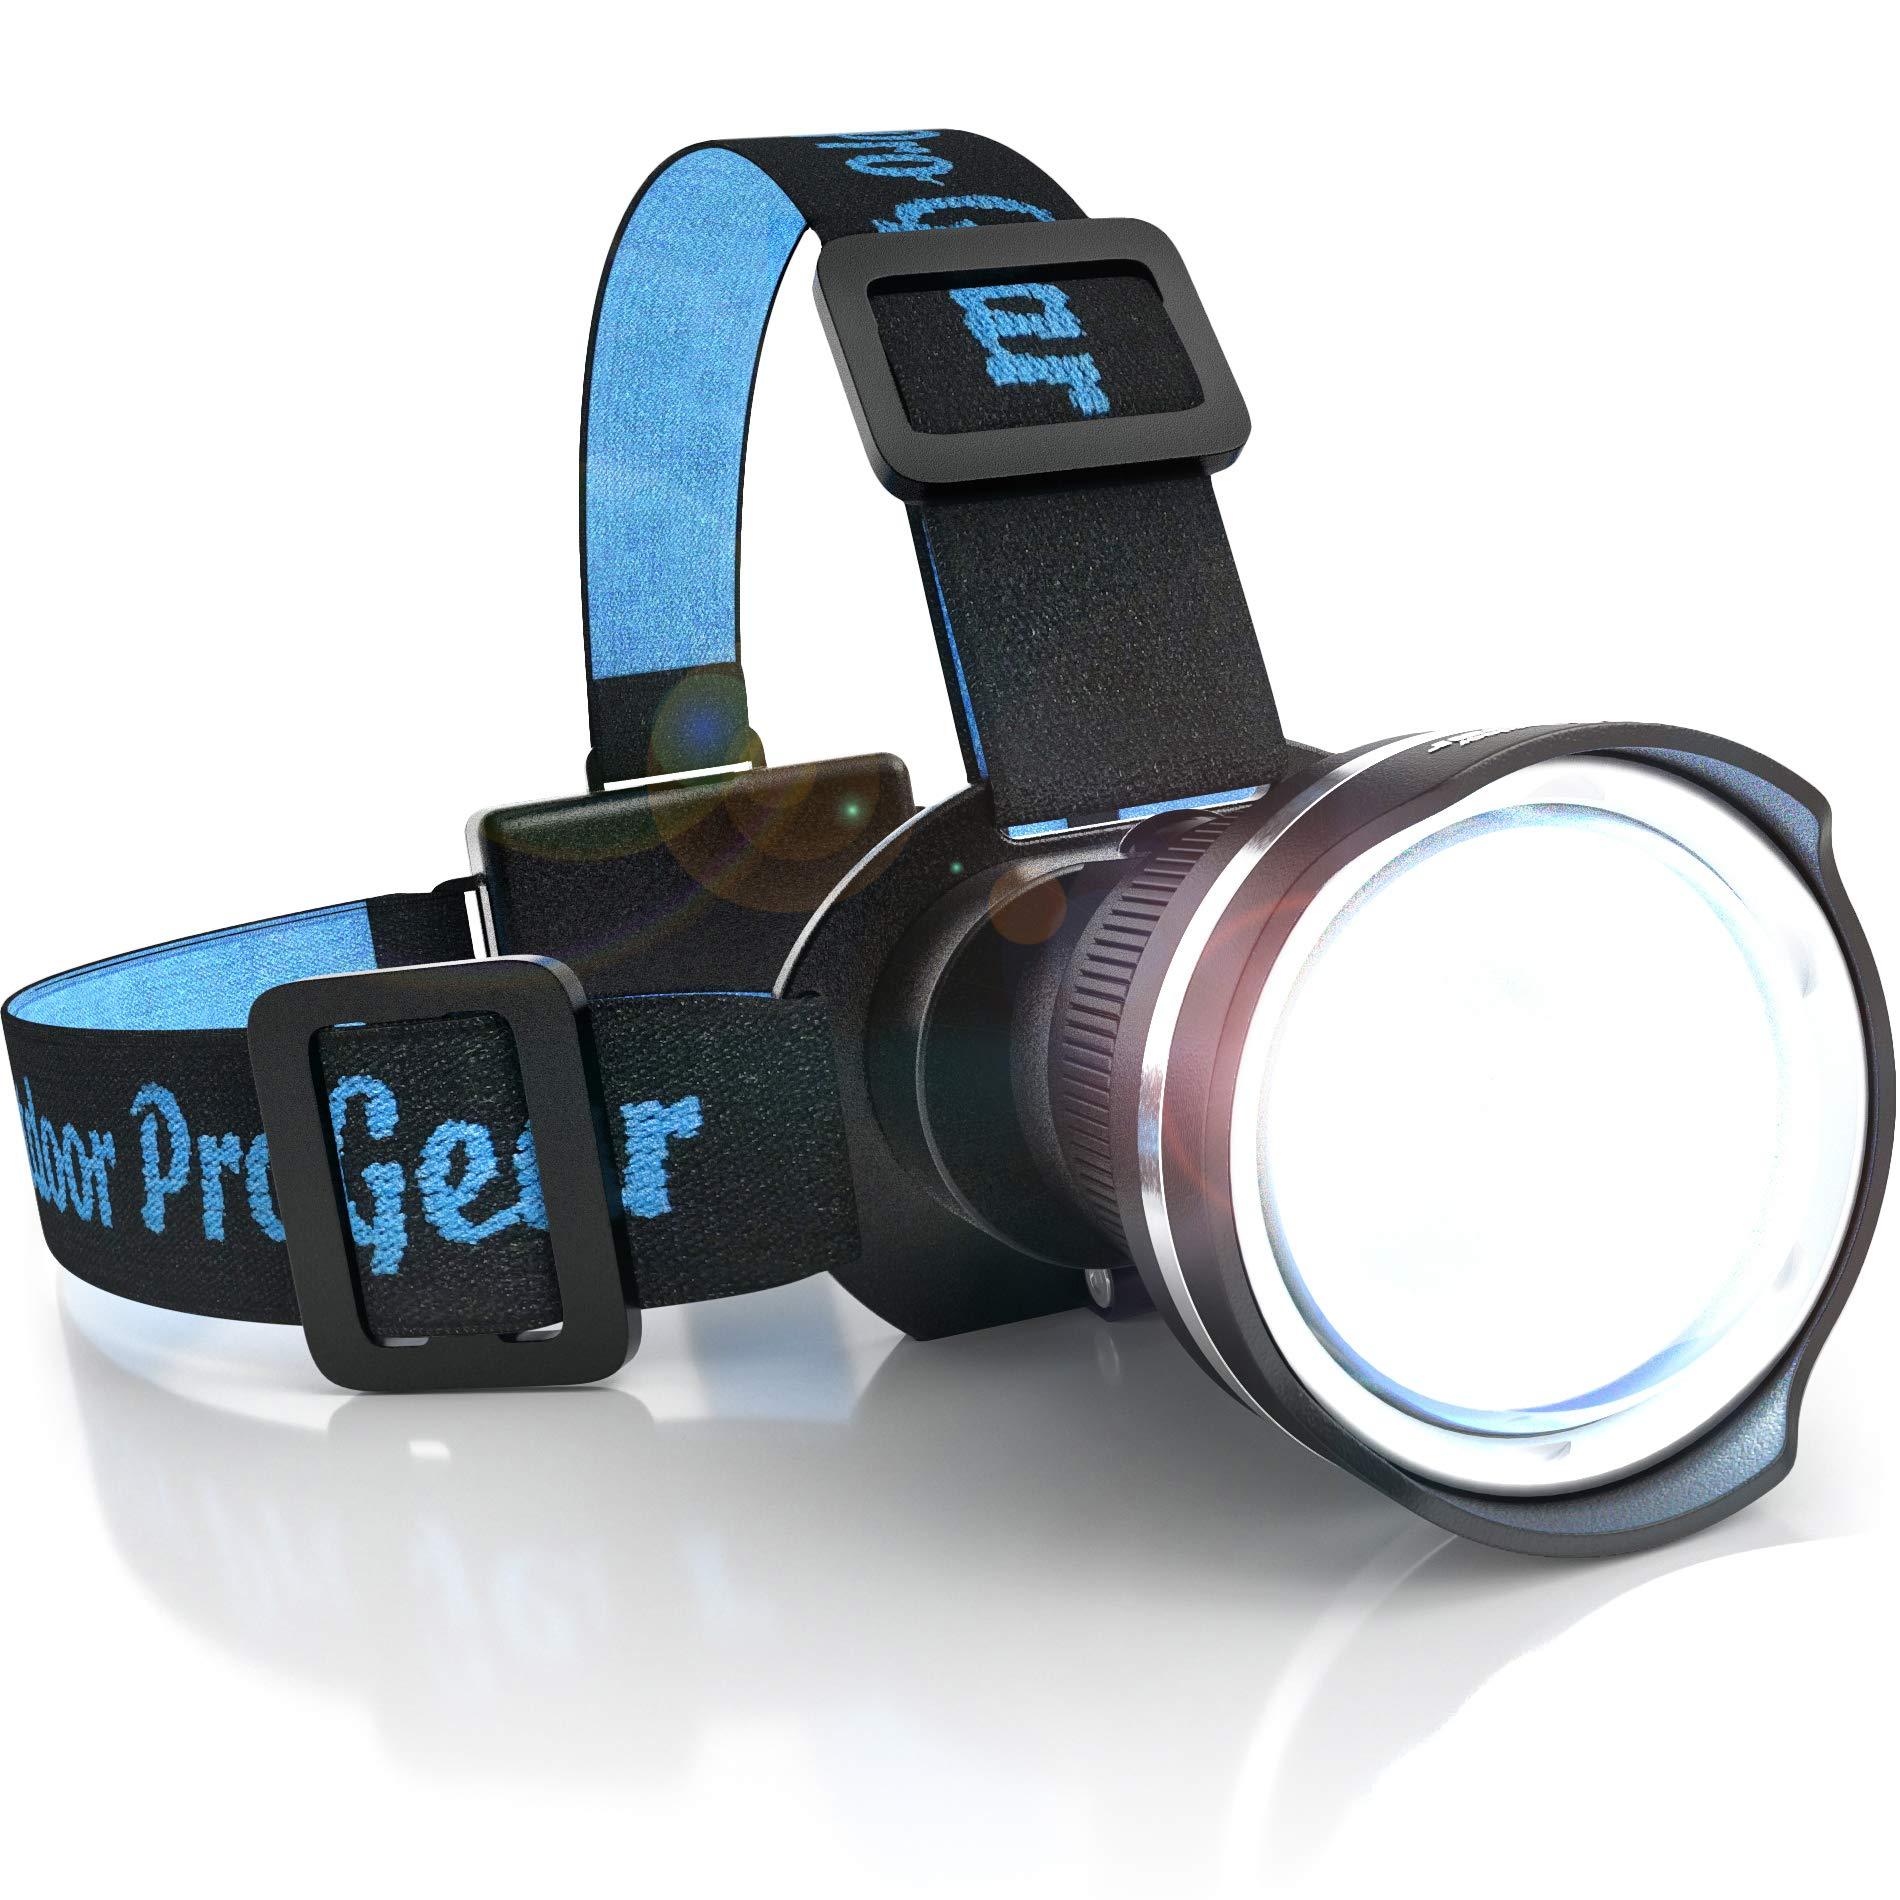 SUPER BRIGHT LED Headlamp - Best and Brightest Broadbeam Spotlight Headlight - Zoomable Camping light- Hunting Headlamp - Caving Flashlight - Running Head Lamp - Construction Hard Hat Light (BLACK) by Outdoor Pro Gear